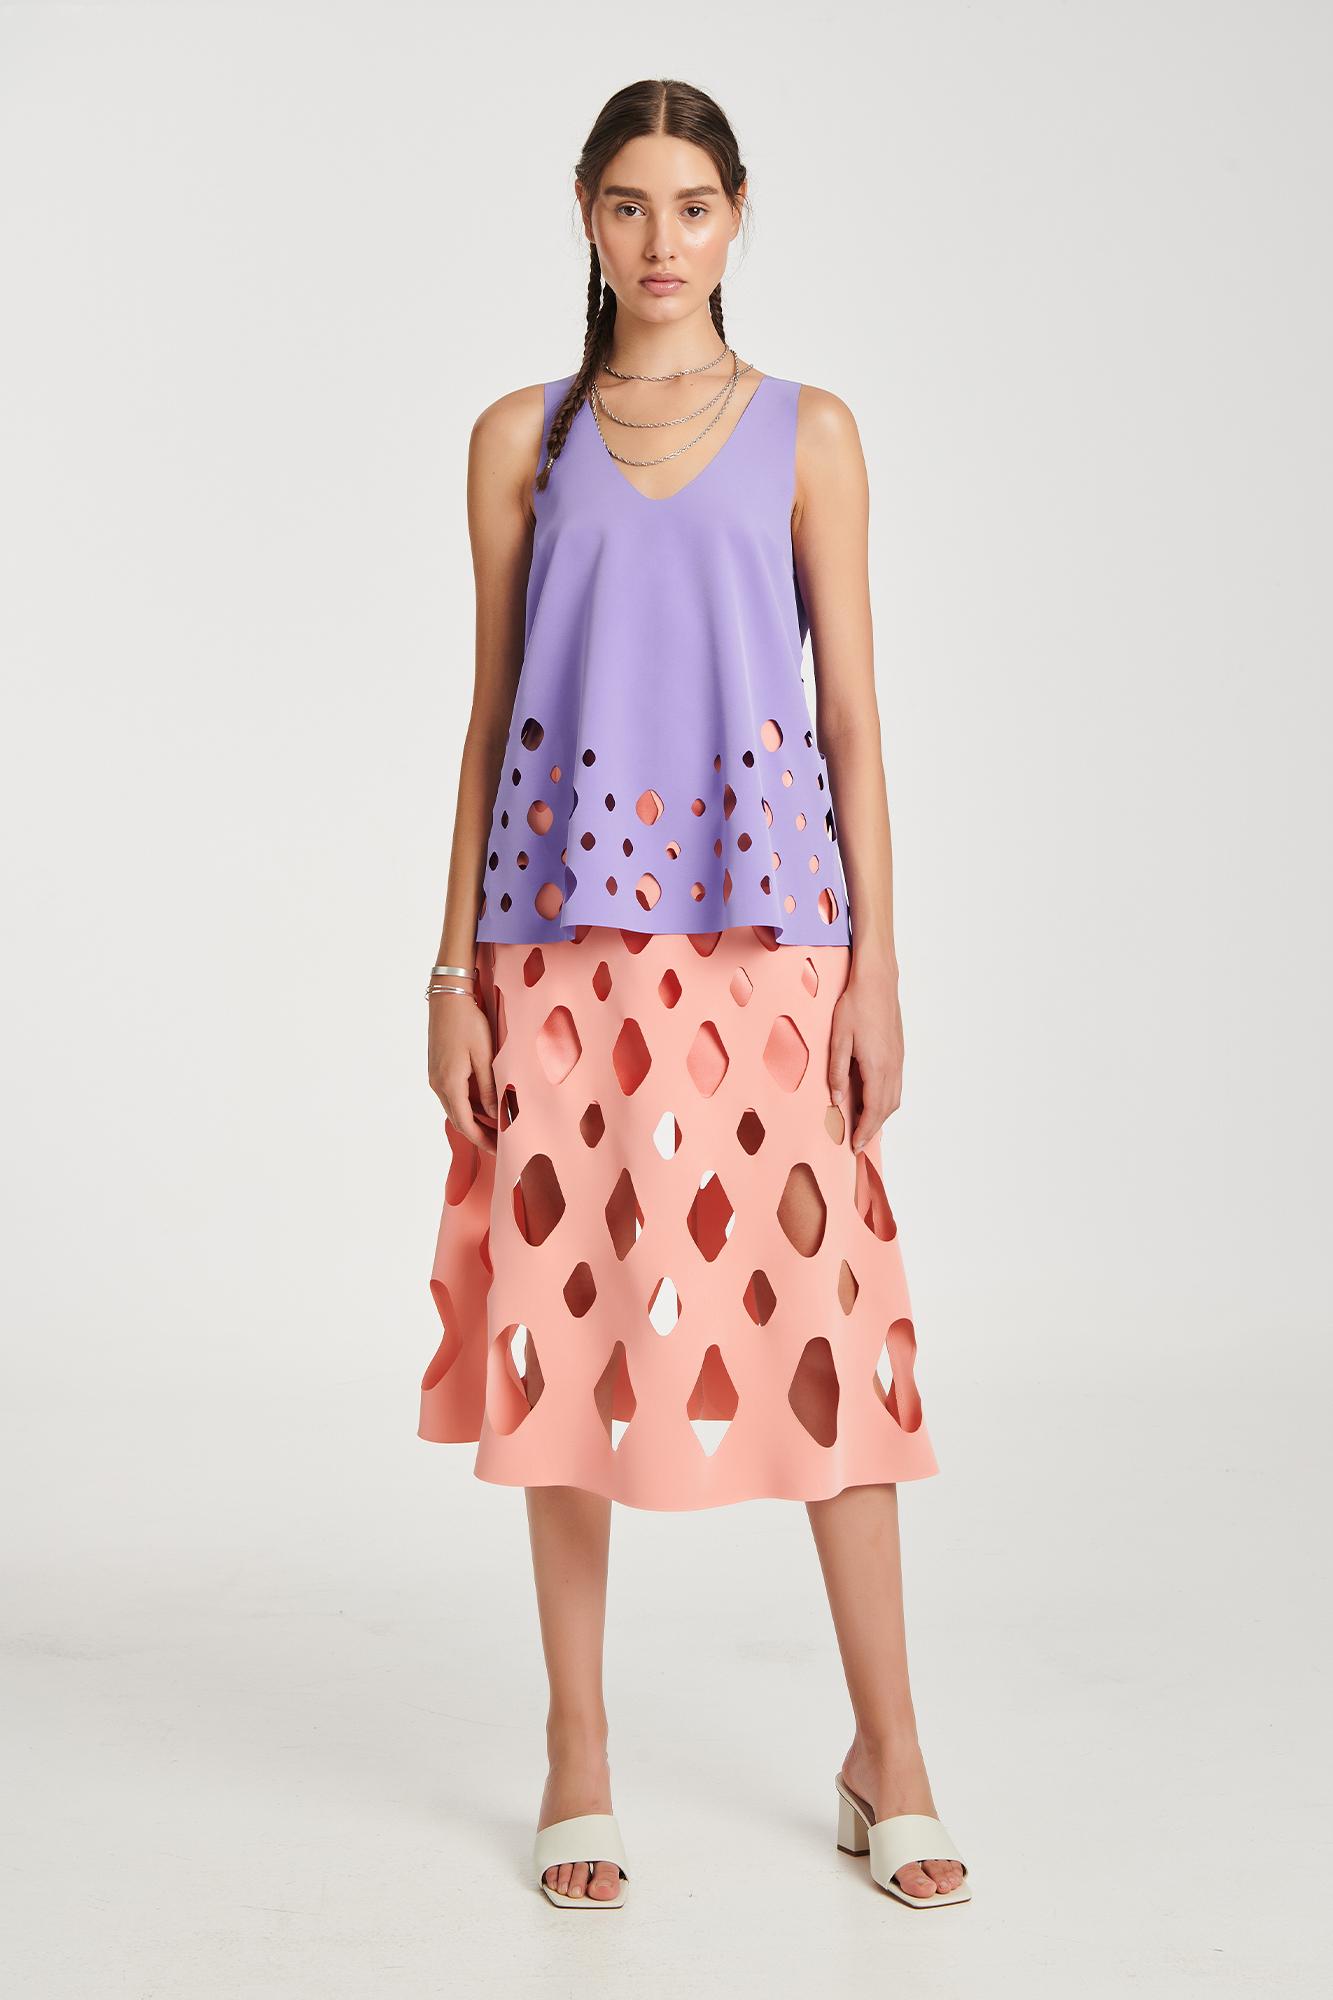 Structural Fashion: Ένα brand δανείζεται τις αρχιτεκτονικές φόρμες και δημιουργεί ξεχωριστά ρούχα